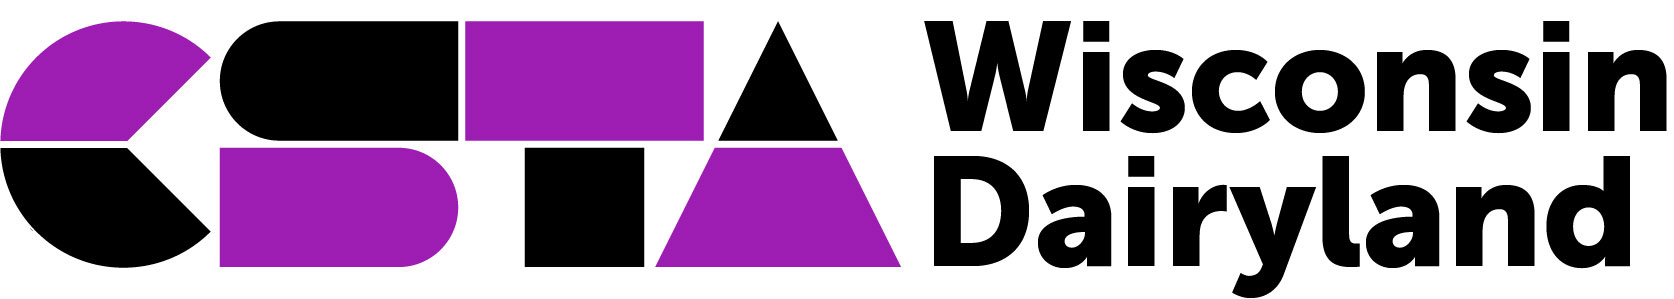 CSTA Wisconsin Logo